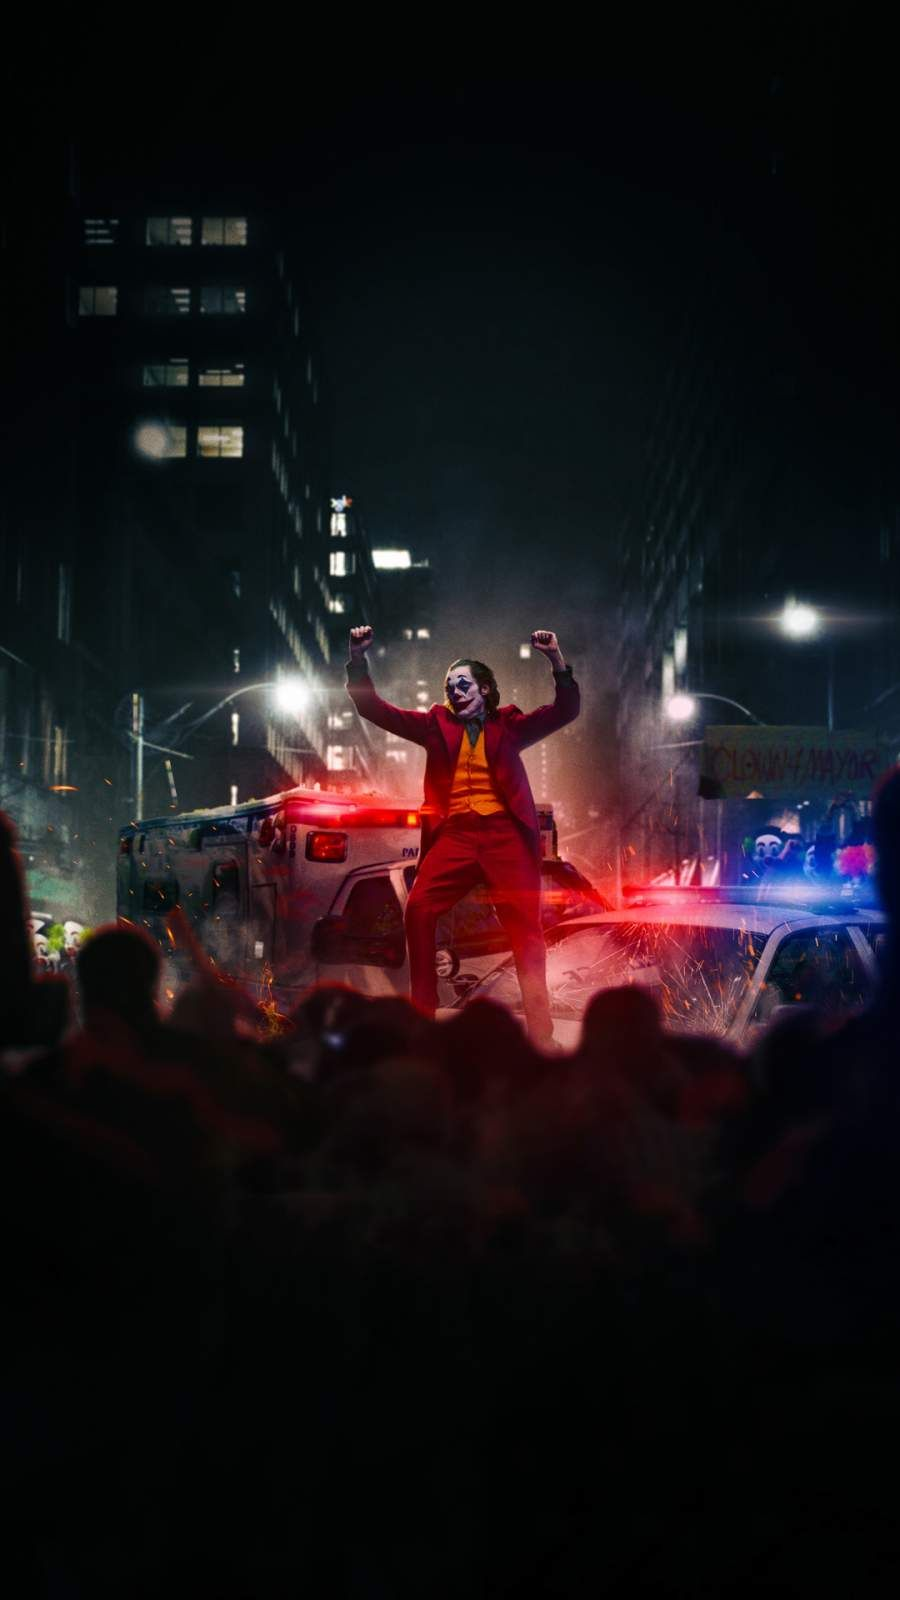 Joker Dancing On Police Car Iphone Wallpaper Joker Wallpapers Joker Iphone Wallpaper Joker Images